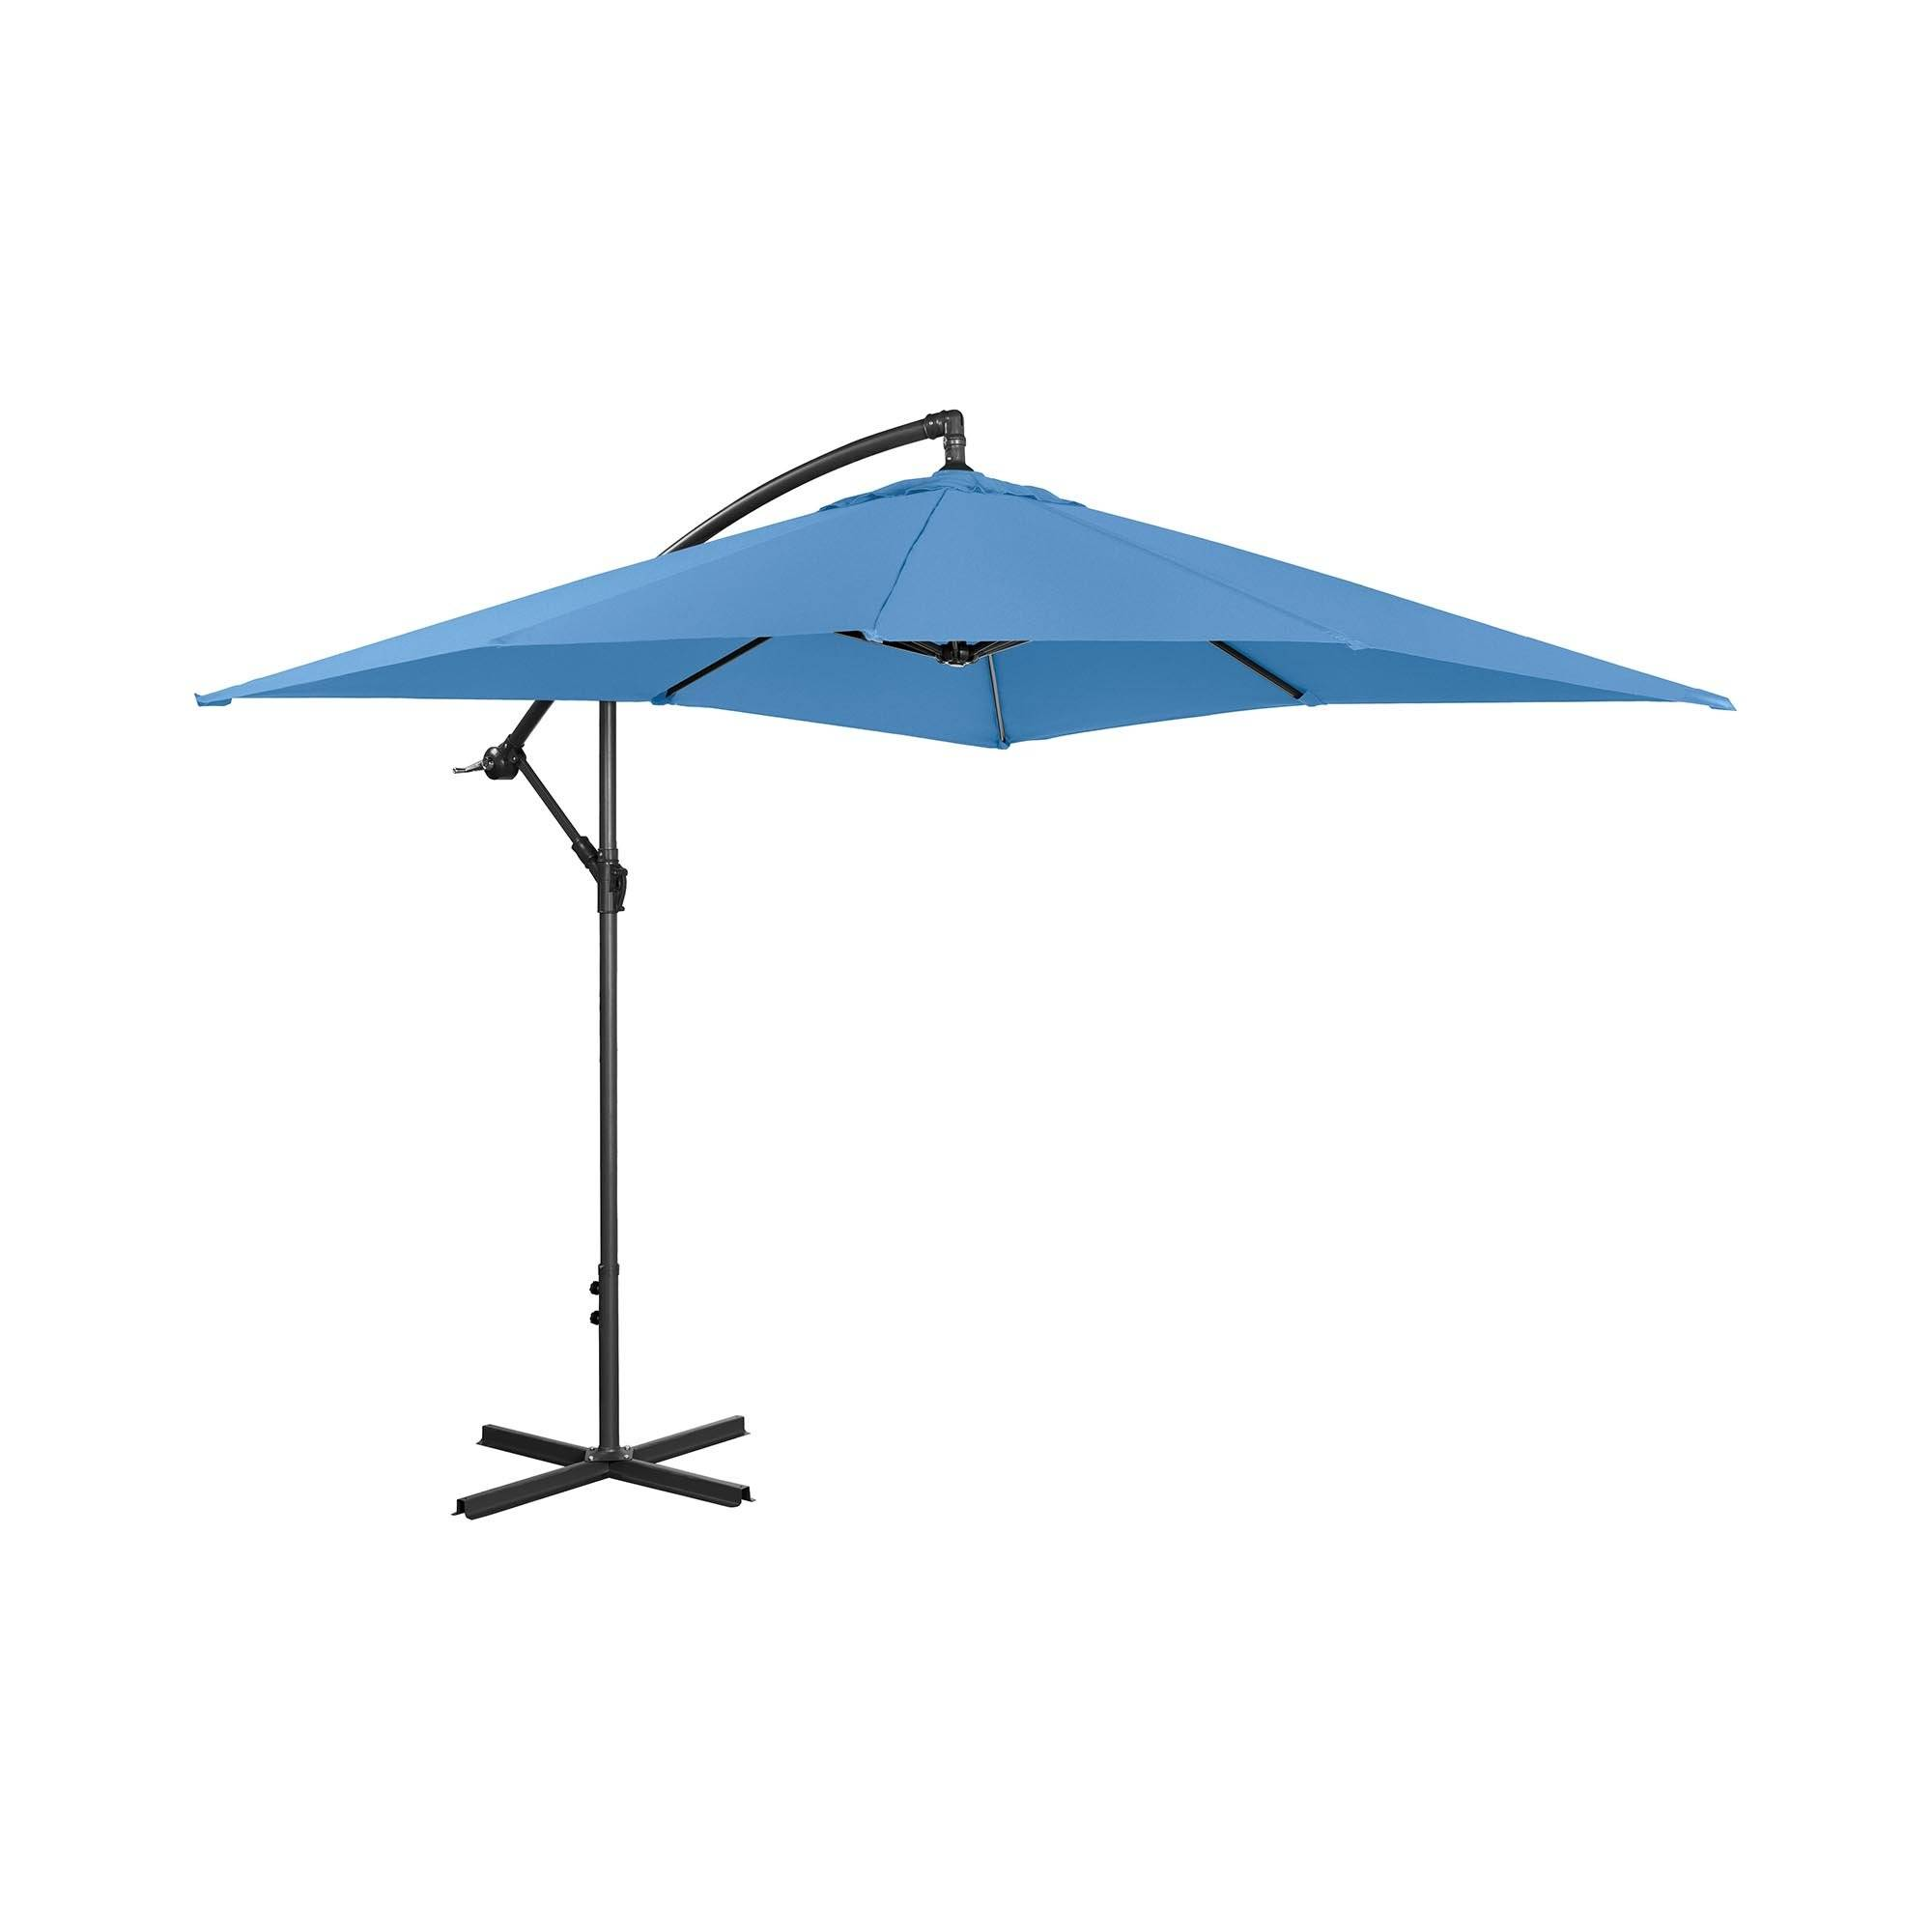 Uniprodo Hængeparasol - blå - rektangulær - 250 x 250 cm - knæk-position UNI_UMBRELLA_SQ250BL